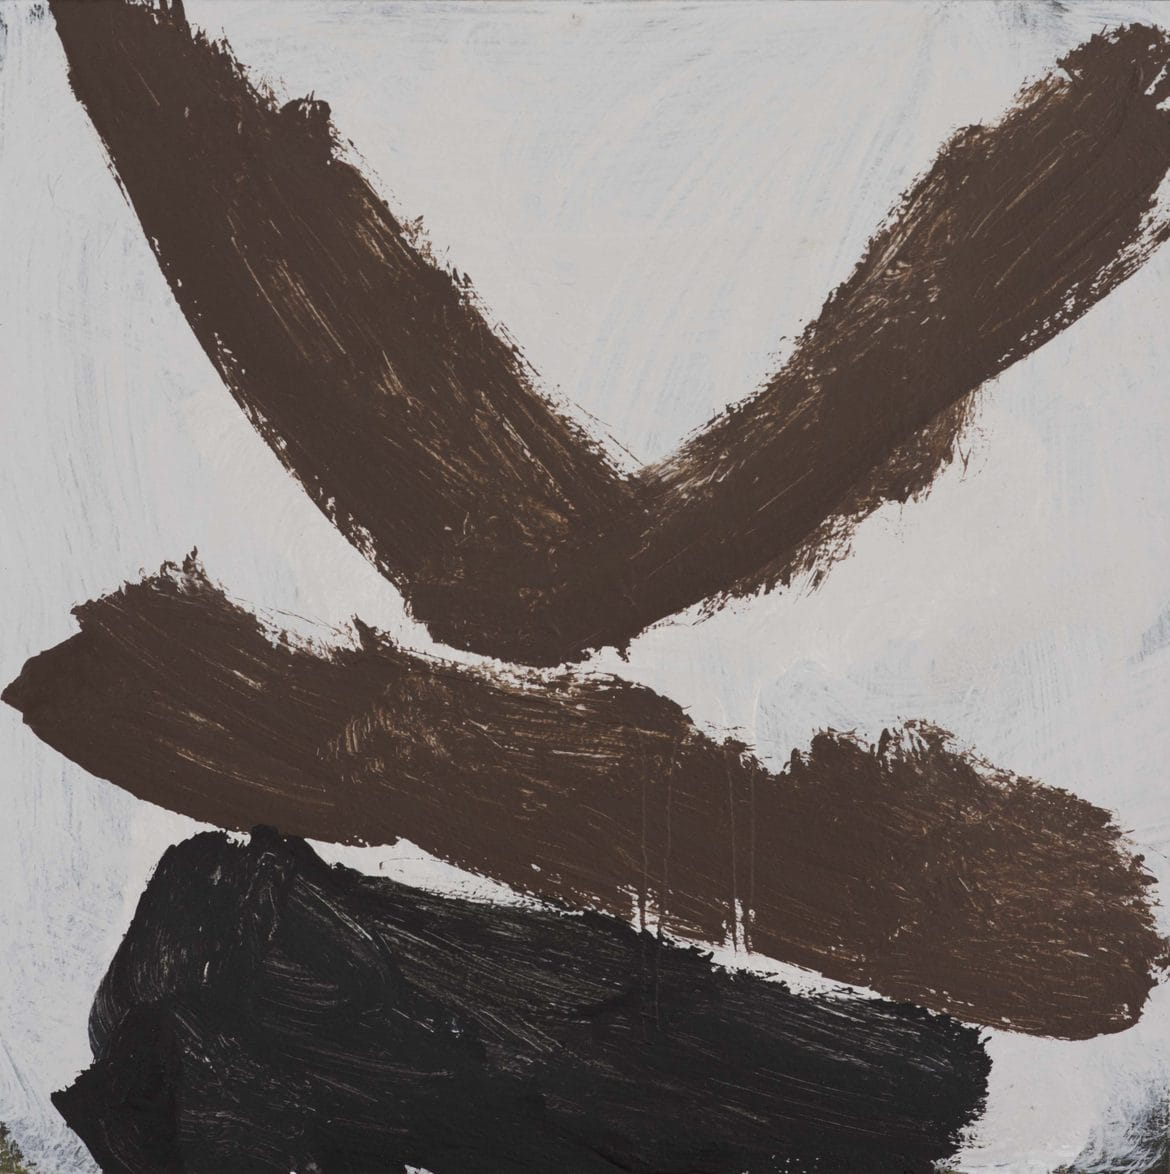 Lottie Consalvo, 'Never End (19)', 2018, acrylic on board, 30 x 30 cm